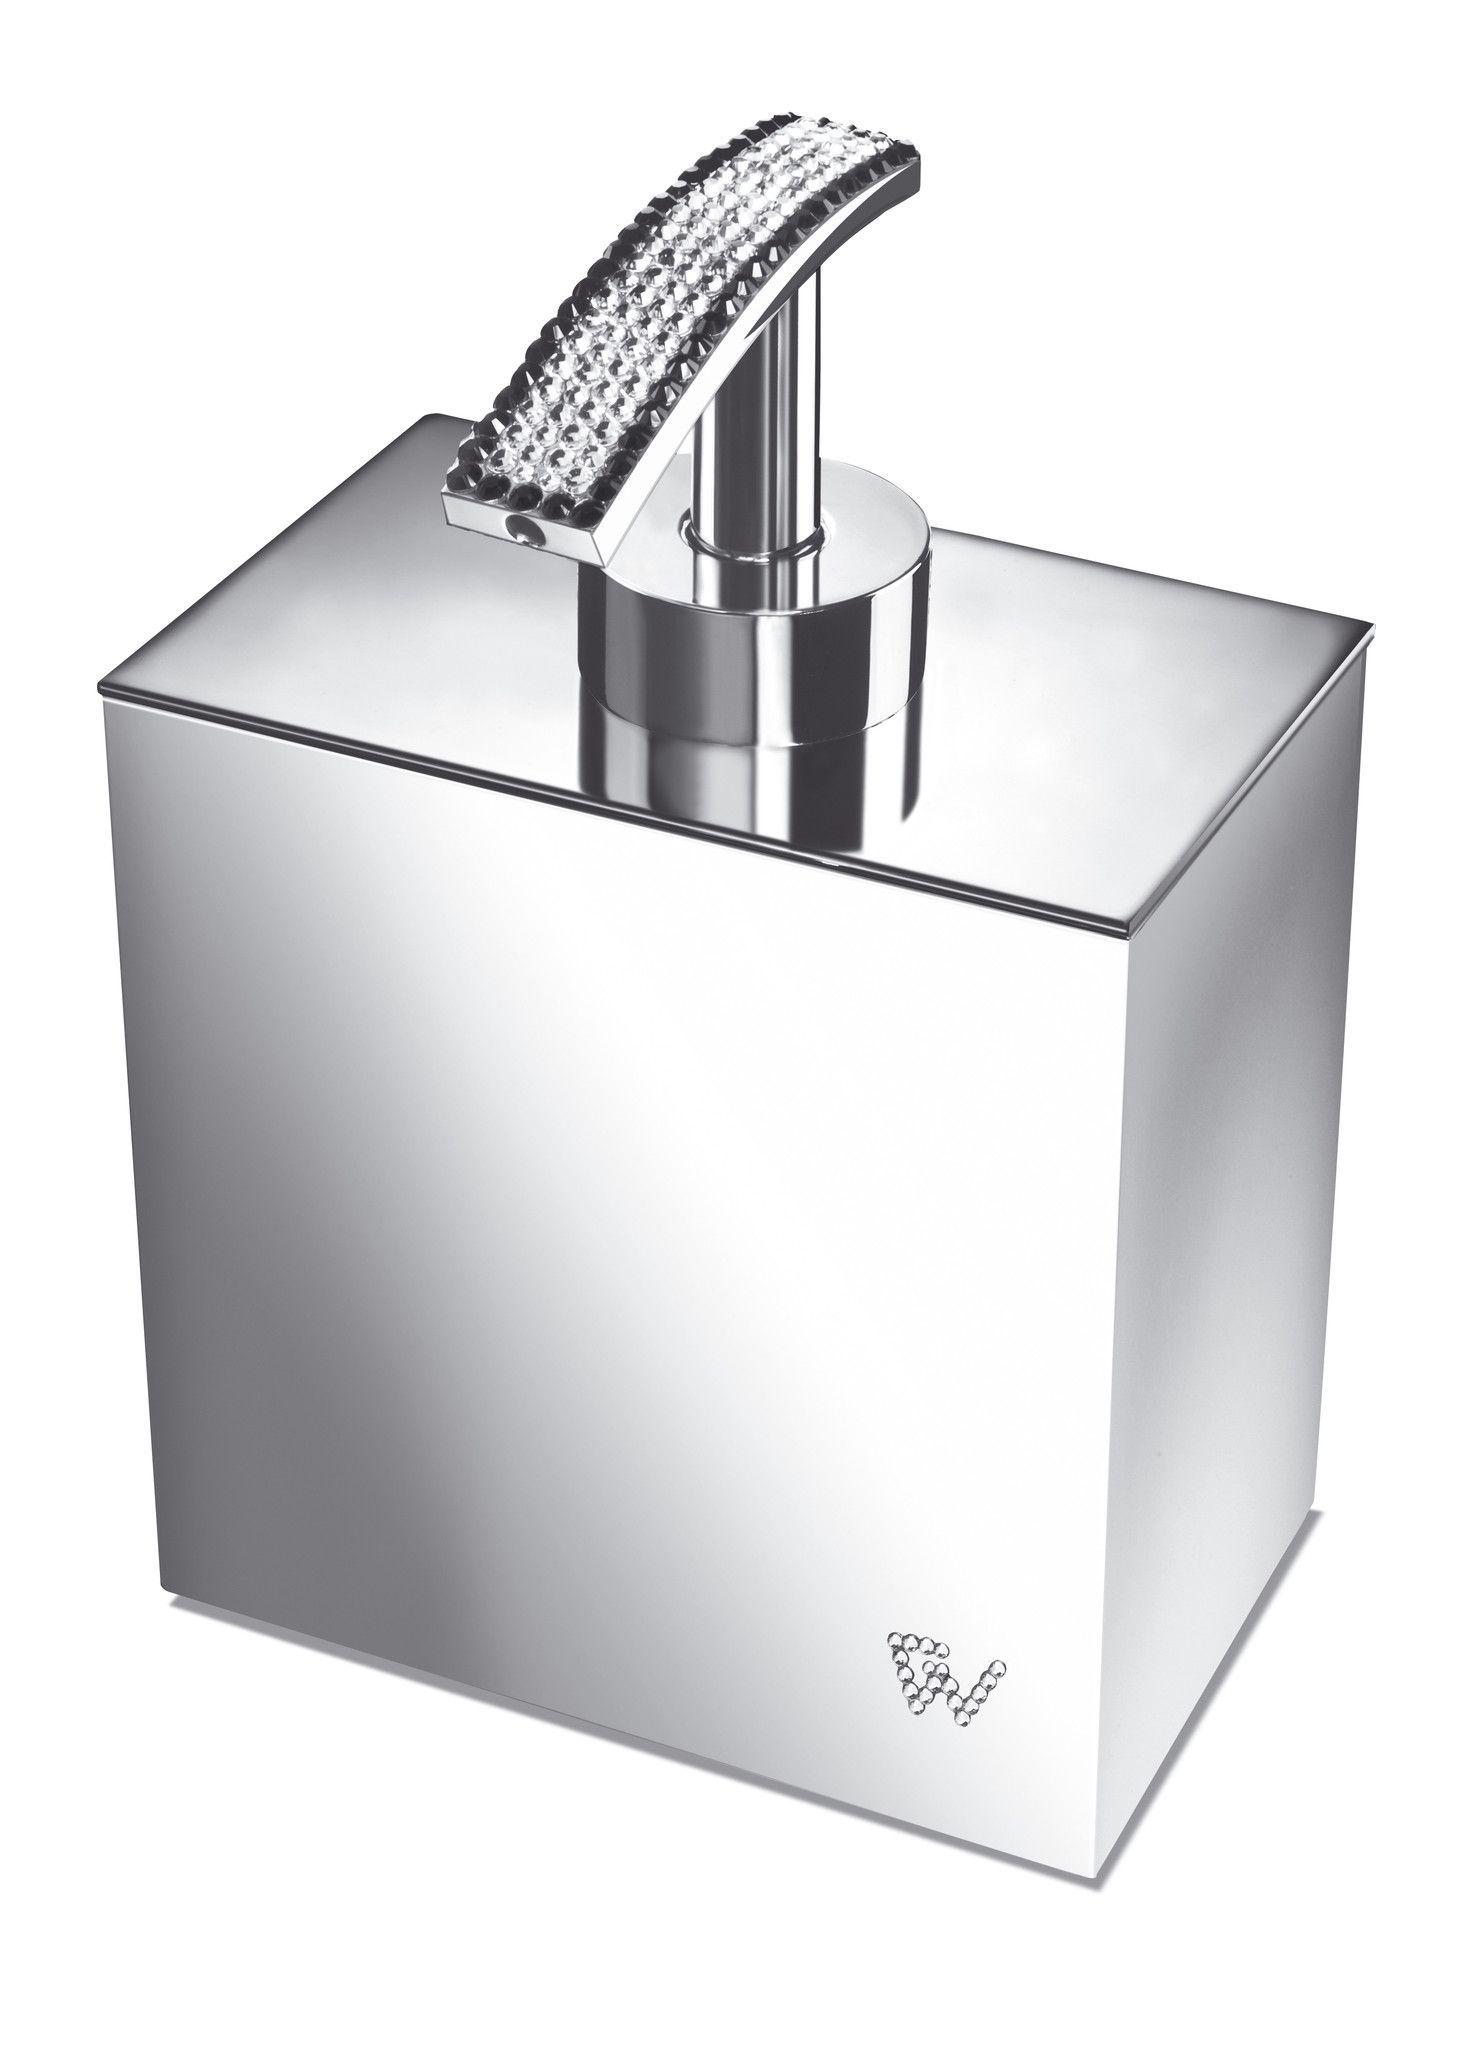 Starlight Square Soap Dispenser W/ Swarovski Crystals